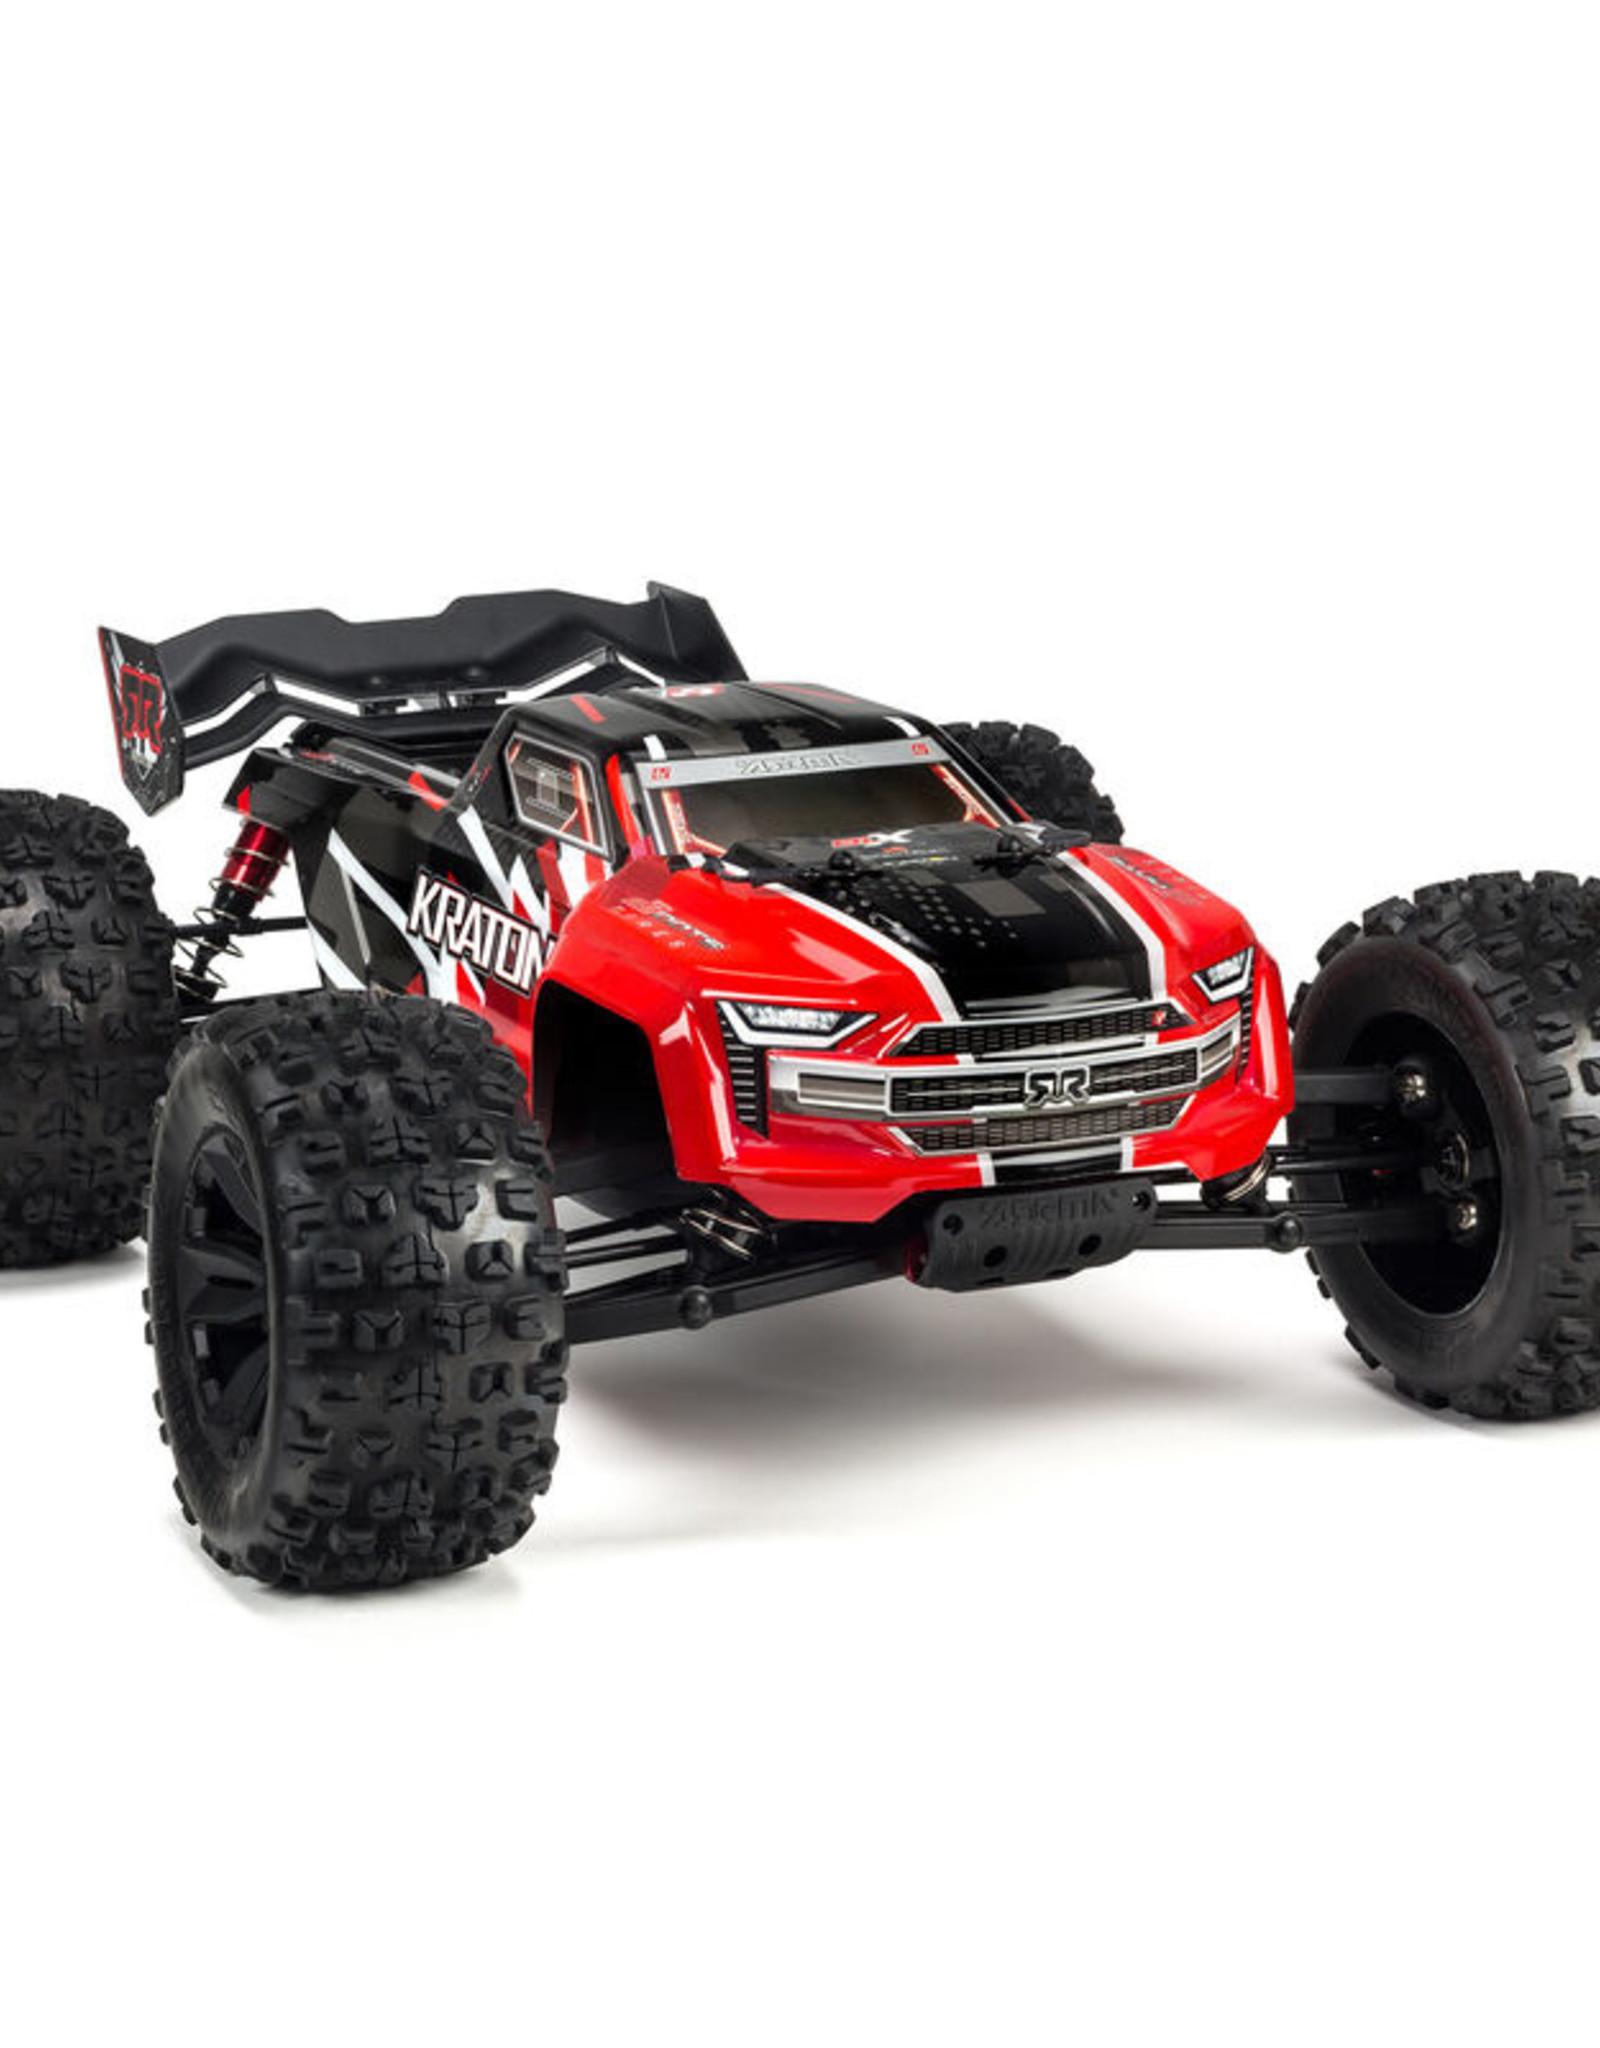 Arrma ARA106040T1 1/8 Kraton 6S 4WD BLX Speed Monster Truck RTR Red